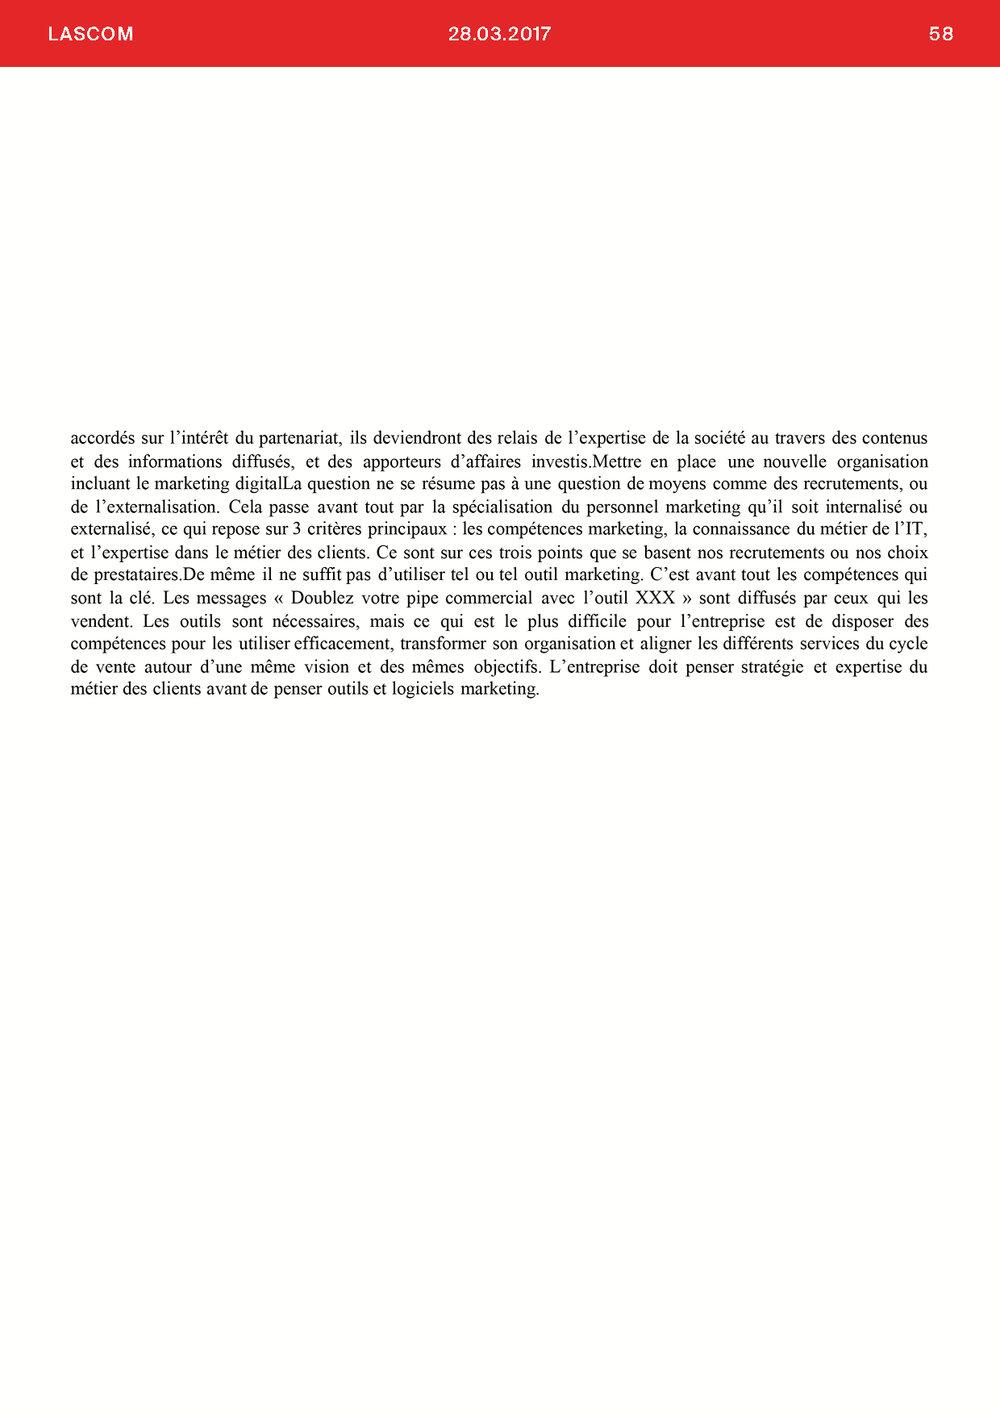 BOOKMEDIA_MARS_WEB58.jpg